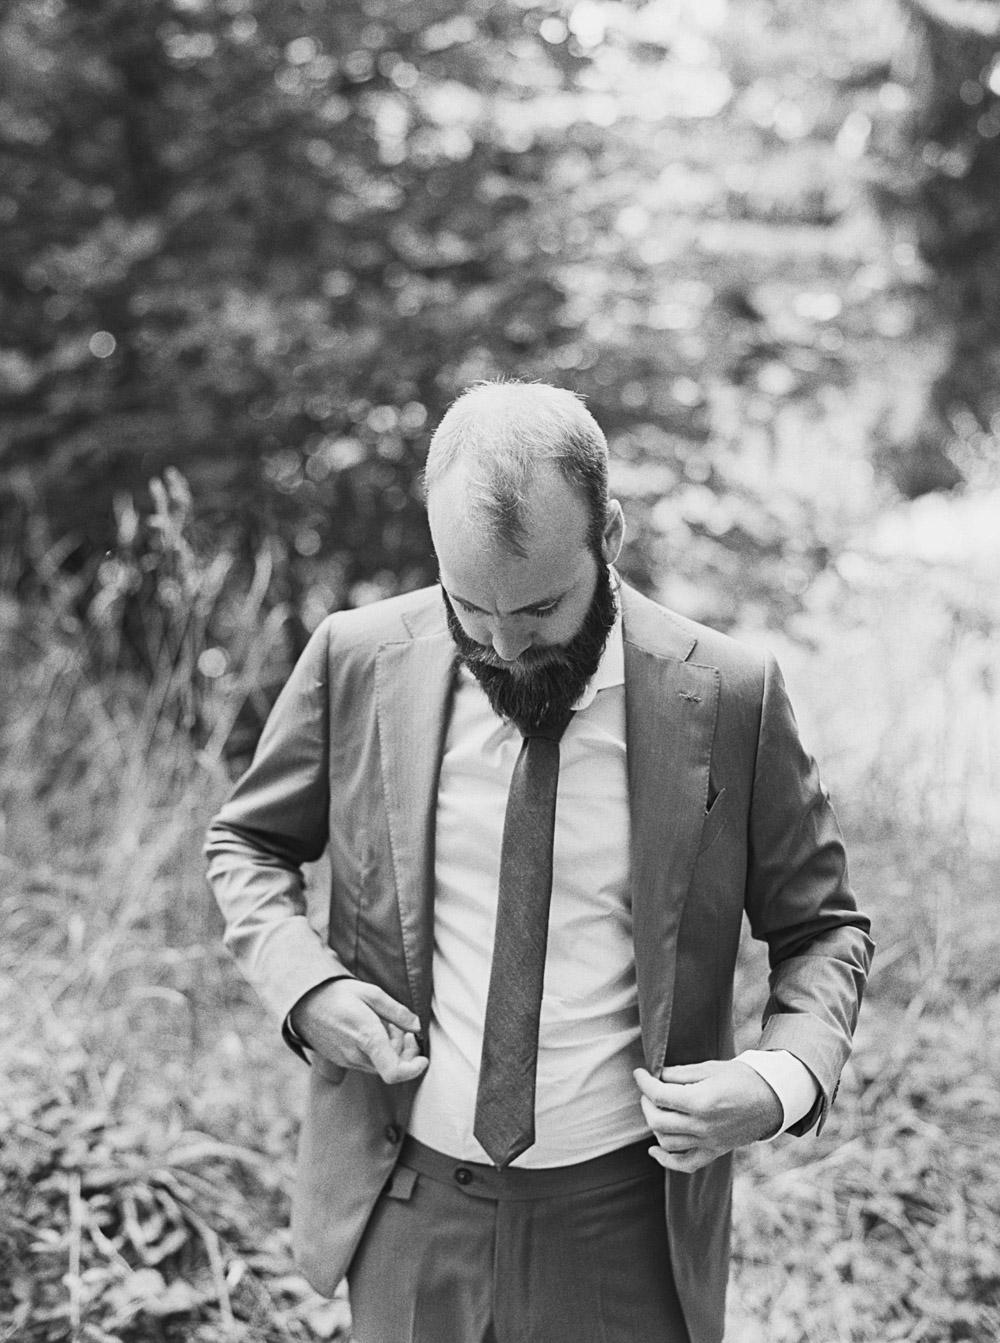 Seattle wedding photographer captures groom buttoning jacket at Wellspring Spa Wedding